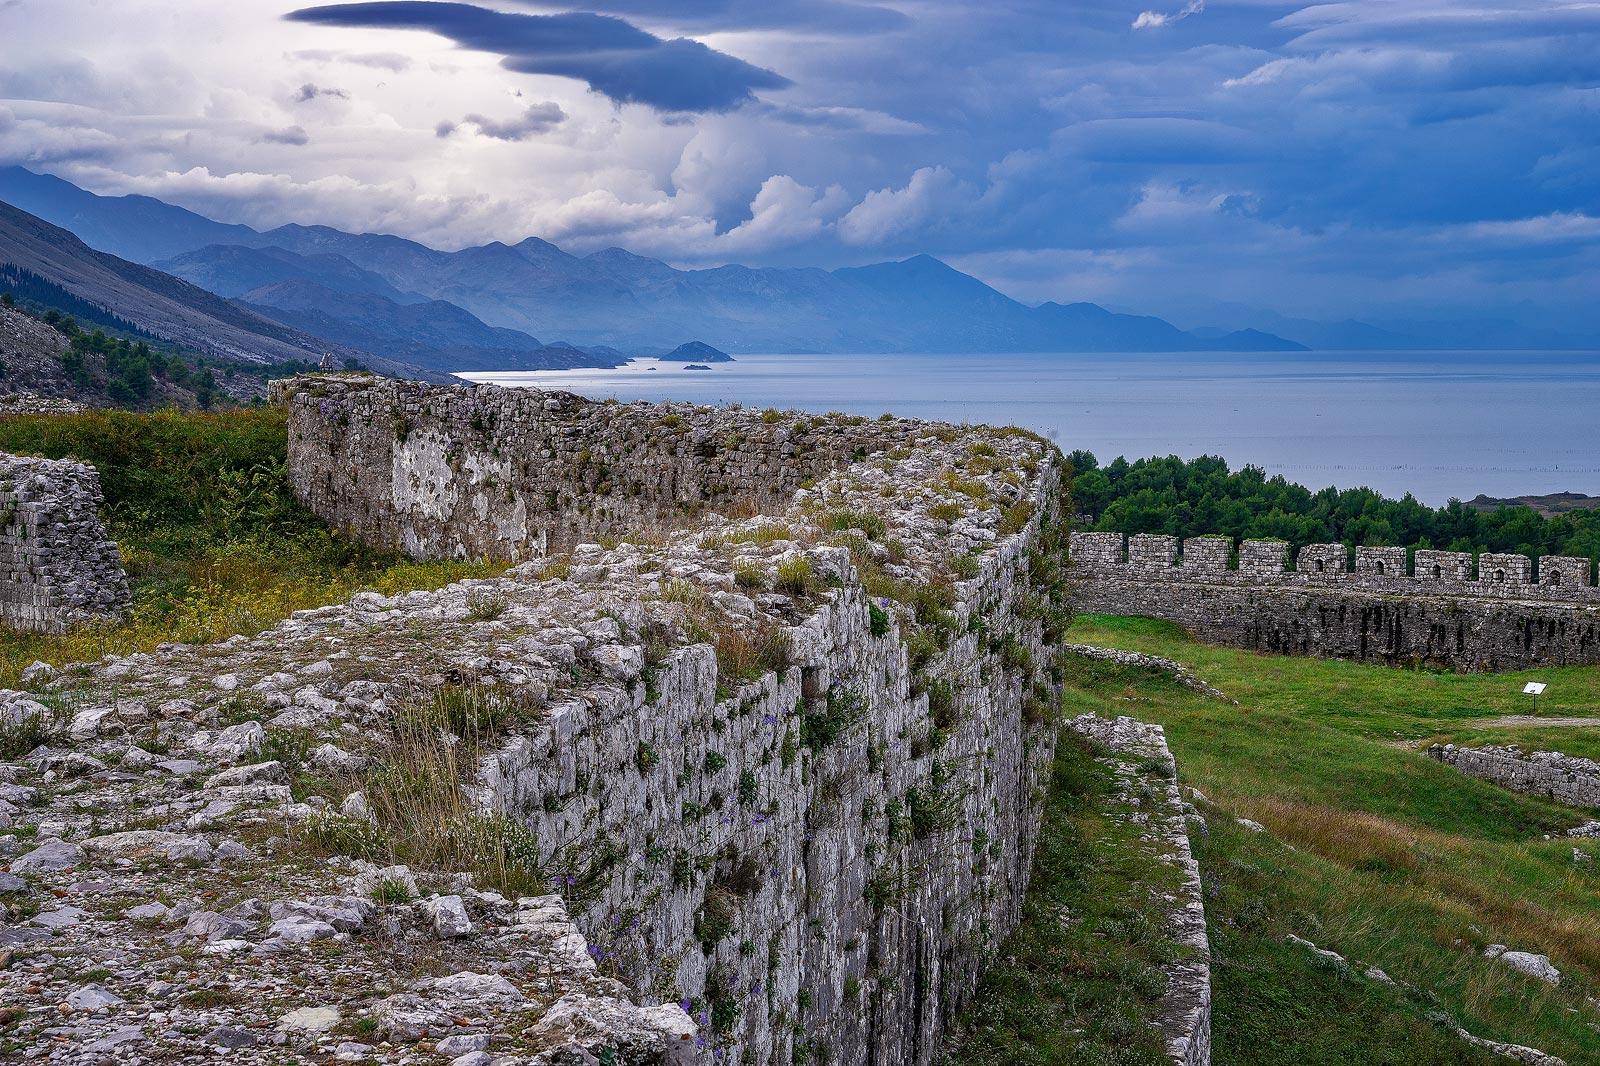 Travel Photos From Shkoder, Albania